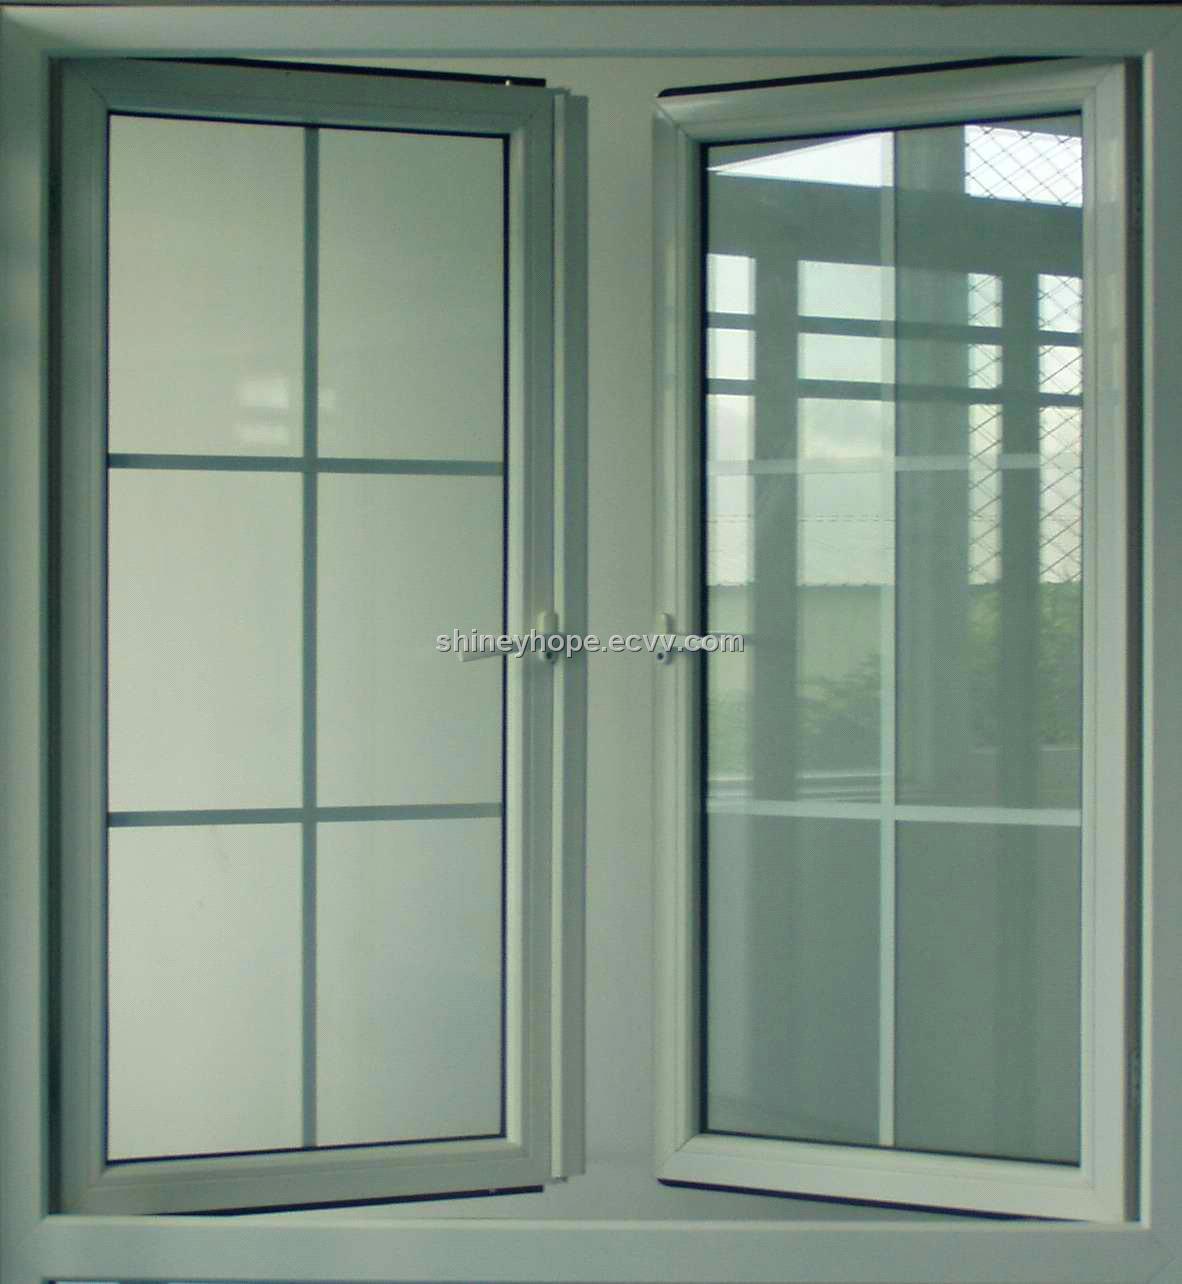 Upvc window purchasing souring agent for Upvc window repairs